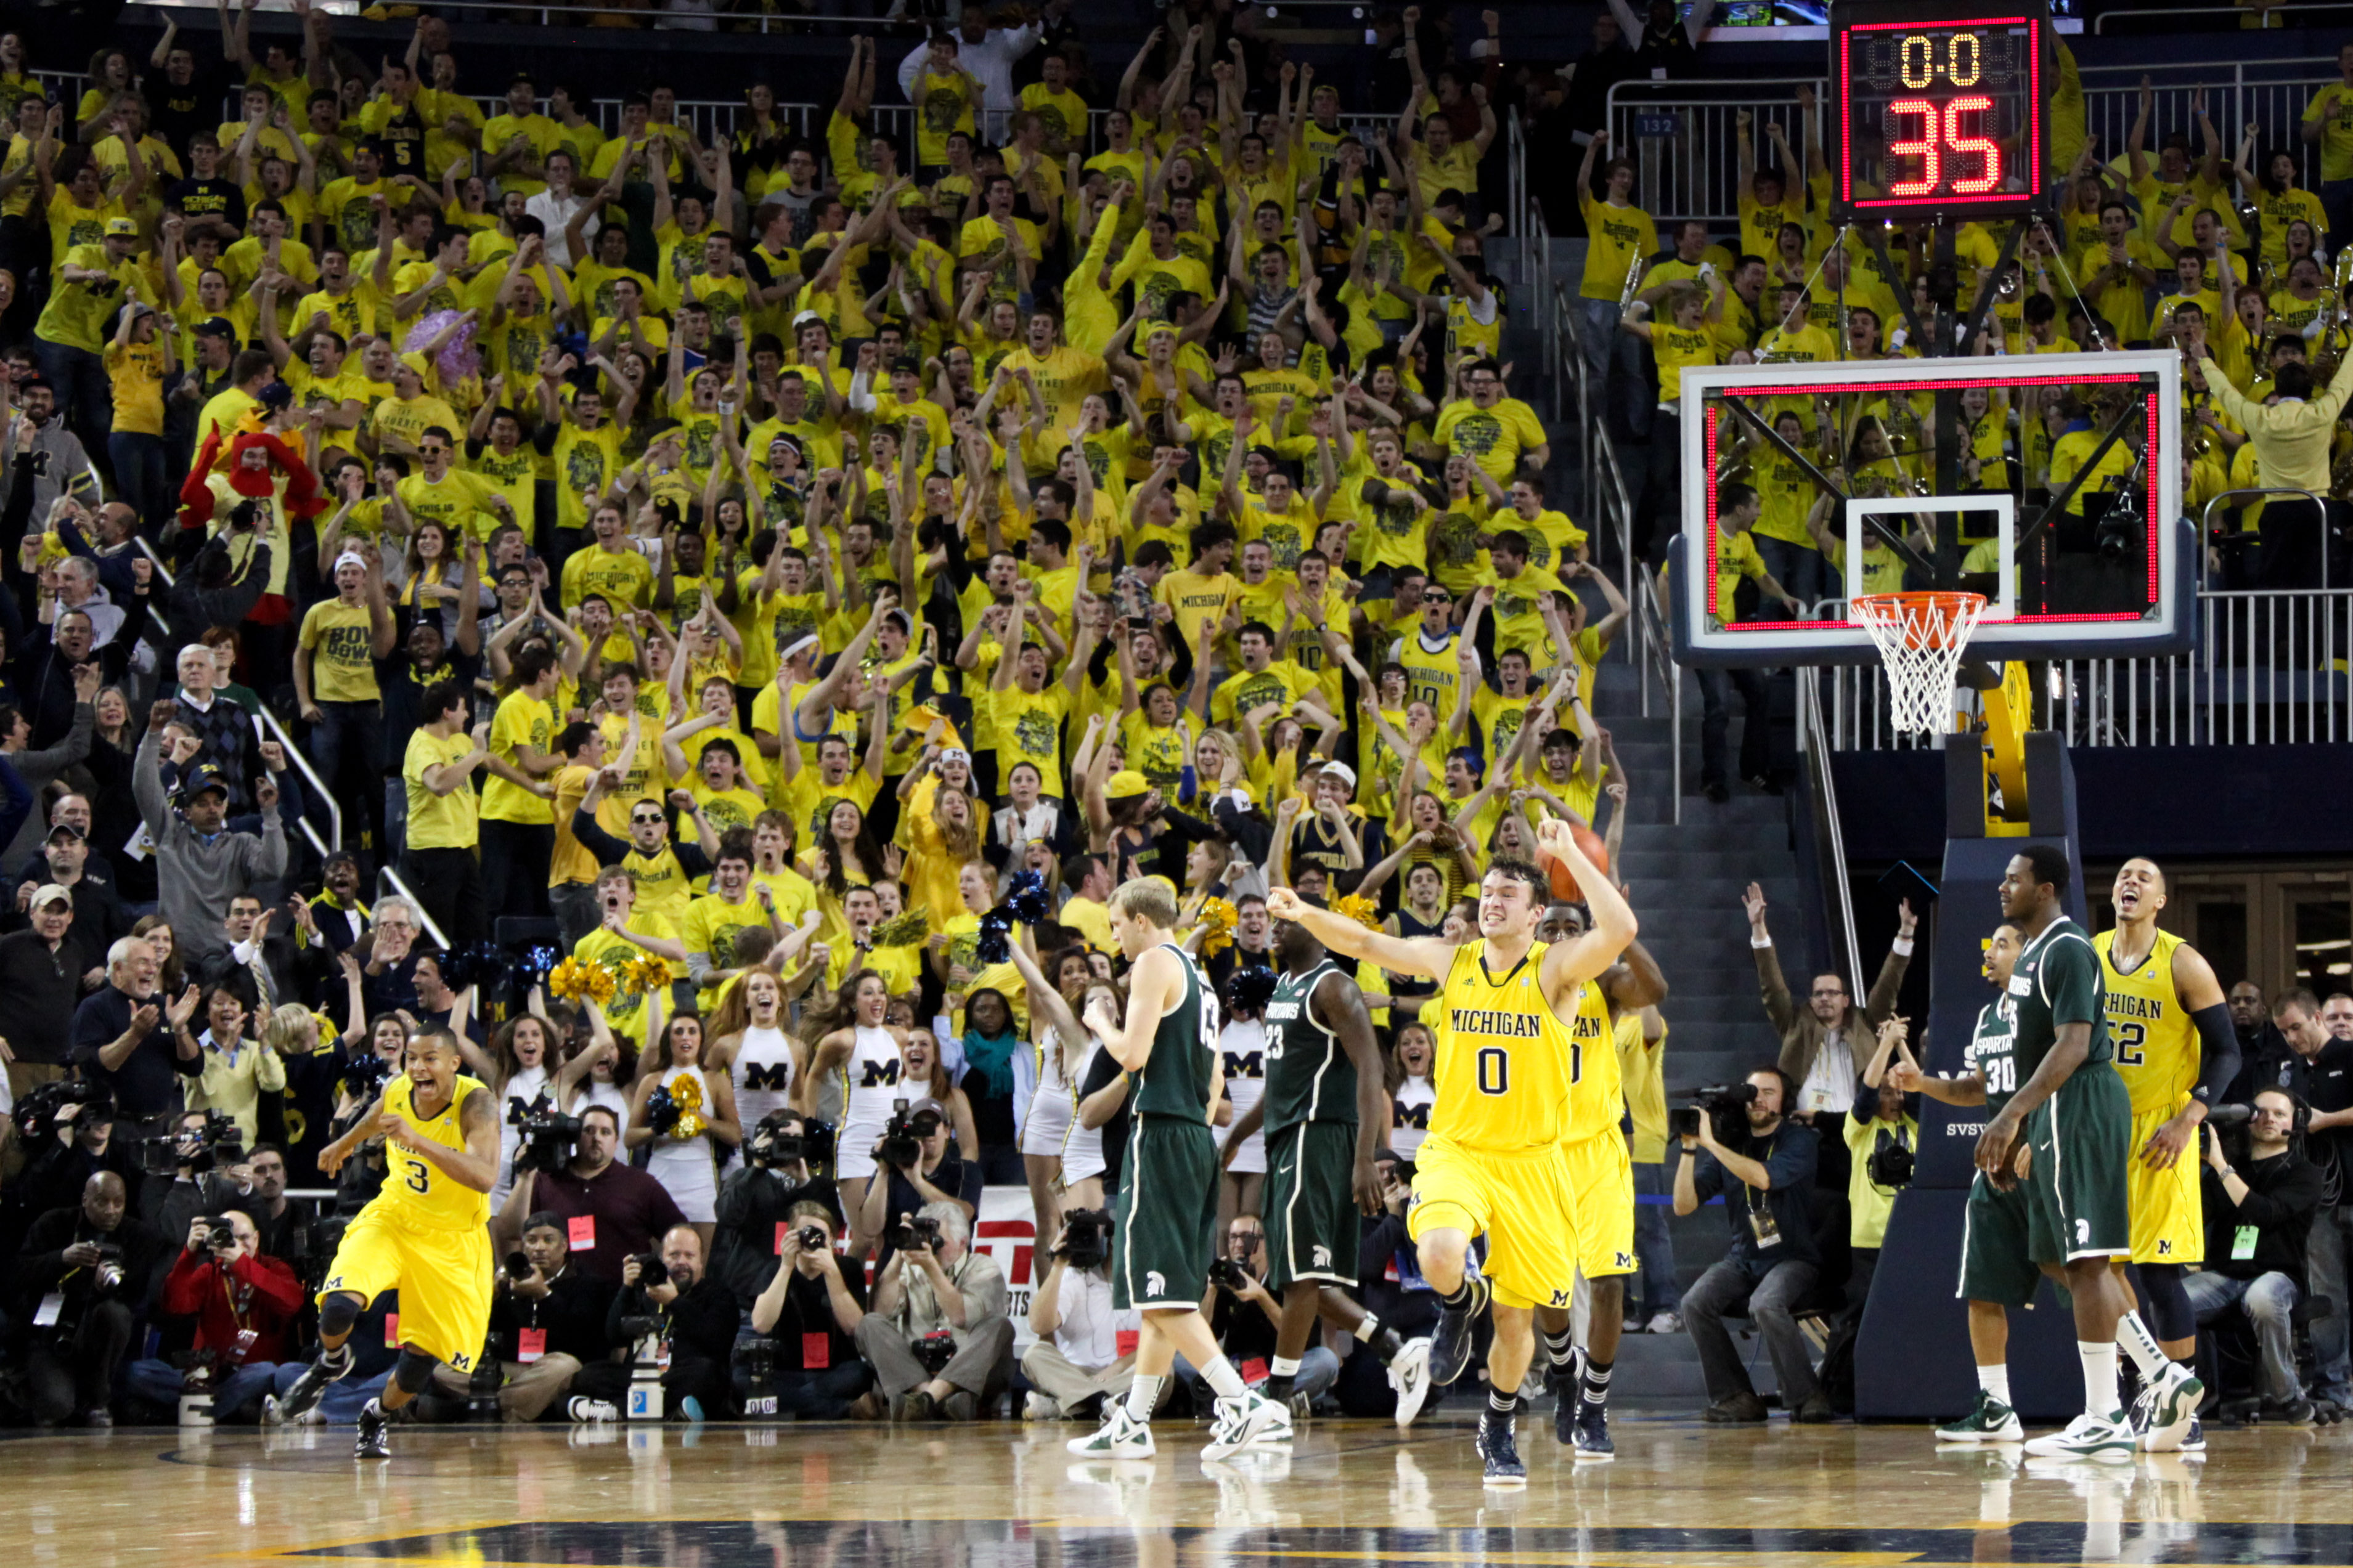 Michigan State at Michigan 30